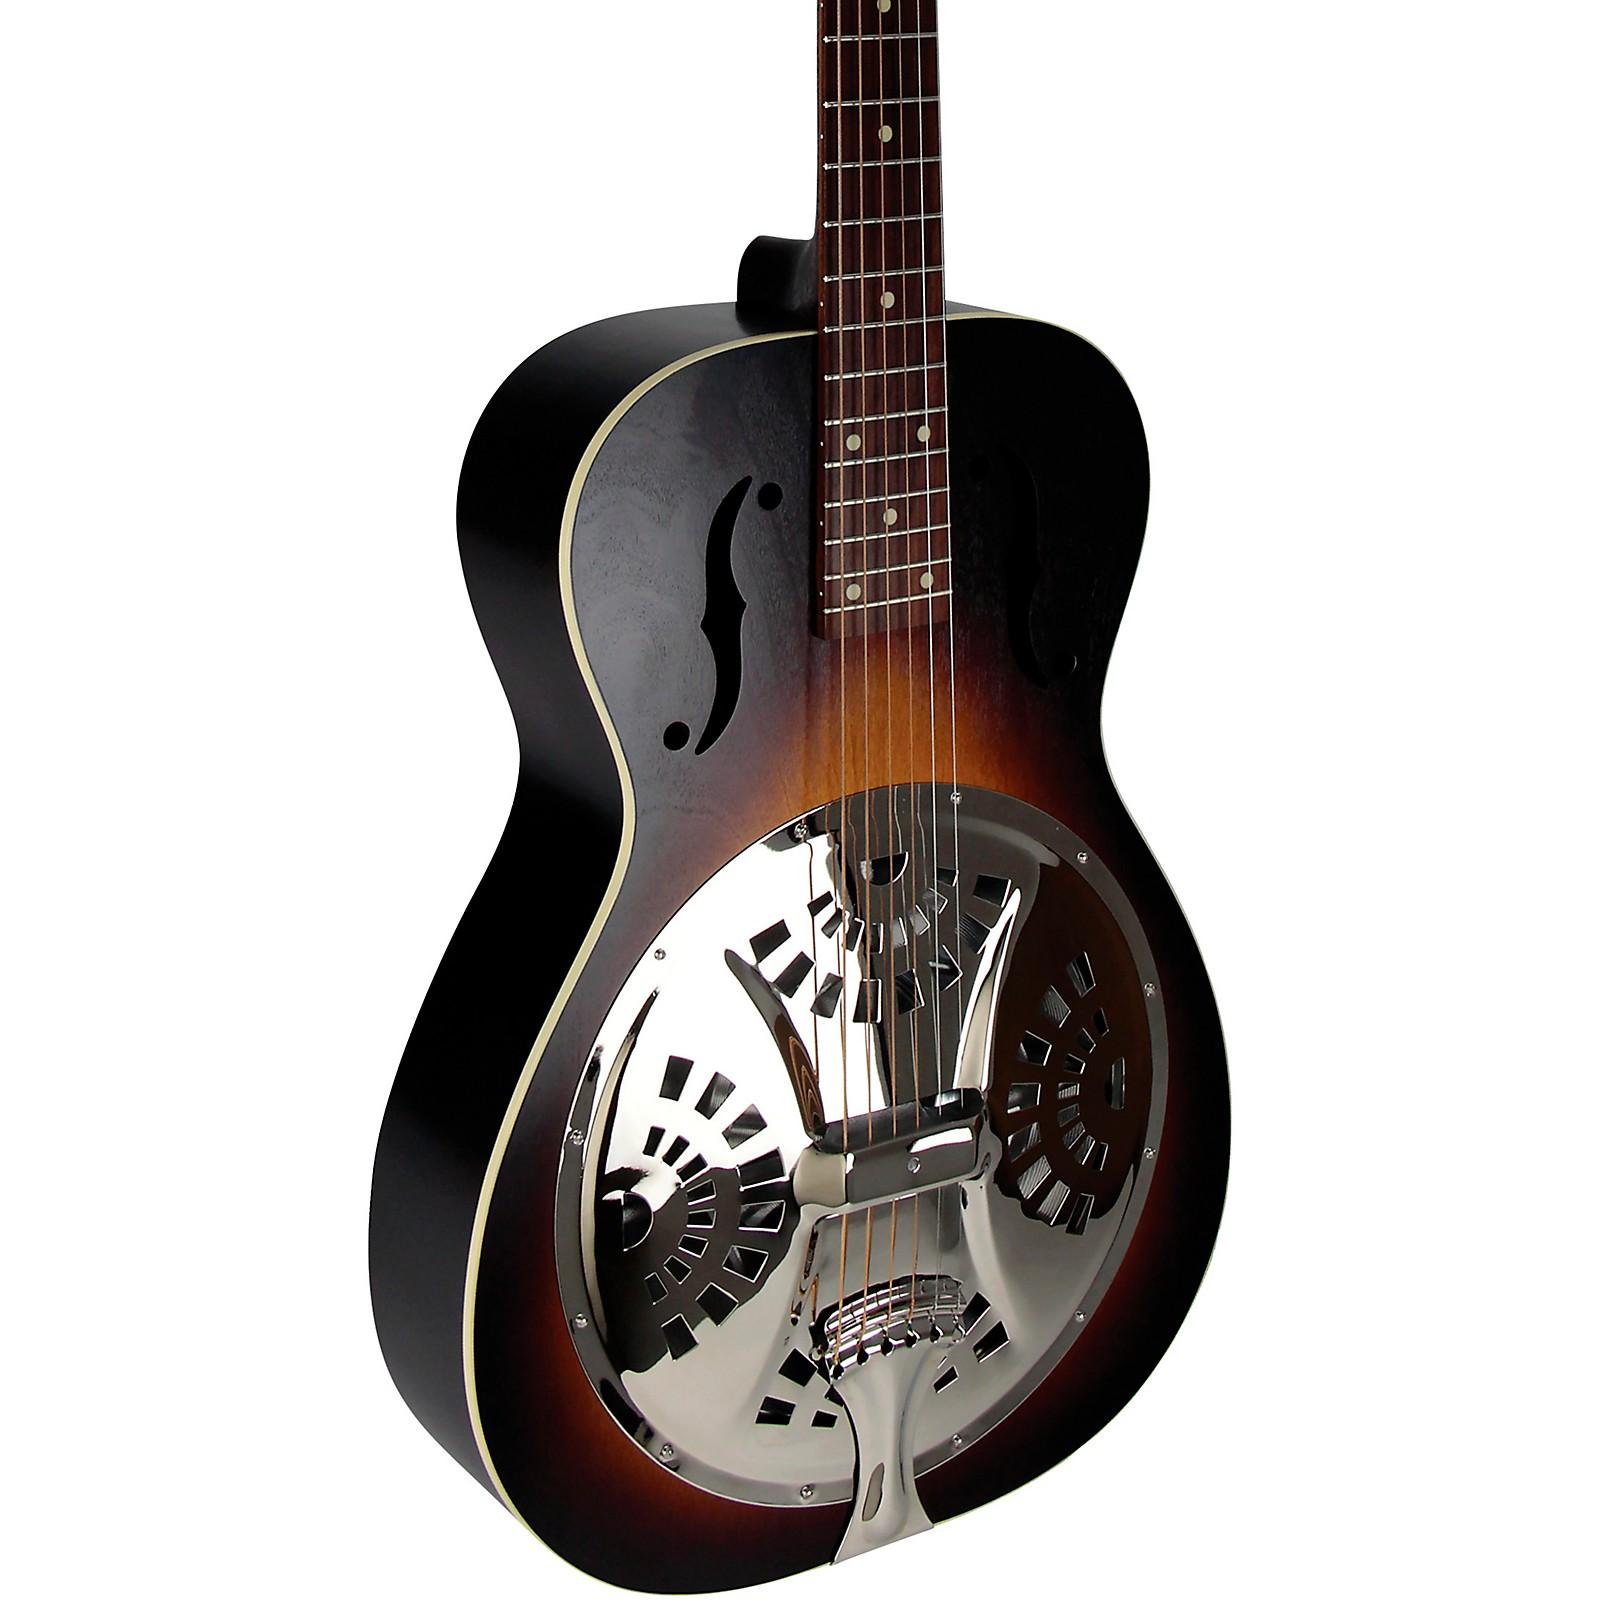 Beard Guitars Deco Phonic Model 27 Roundneck Acoustic-Electric Resonator Guitar